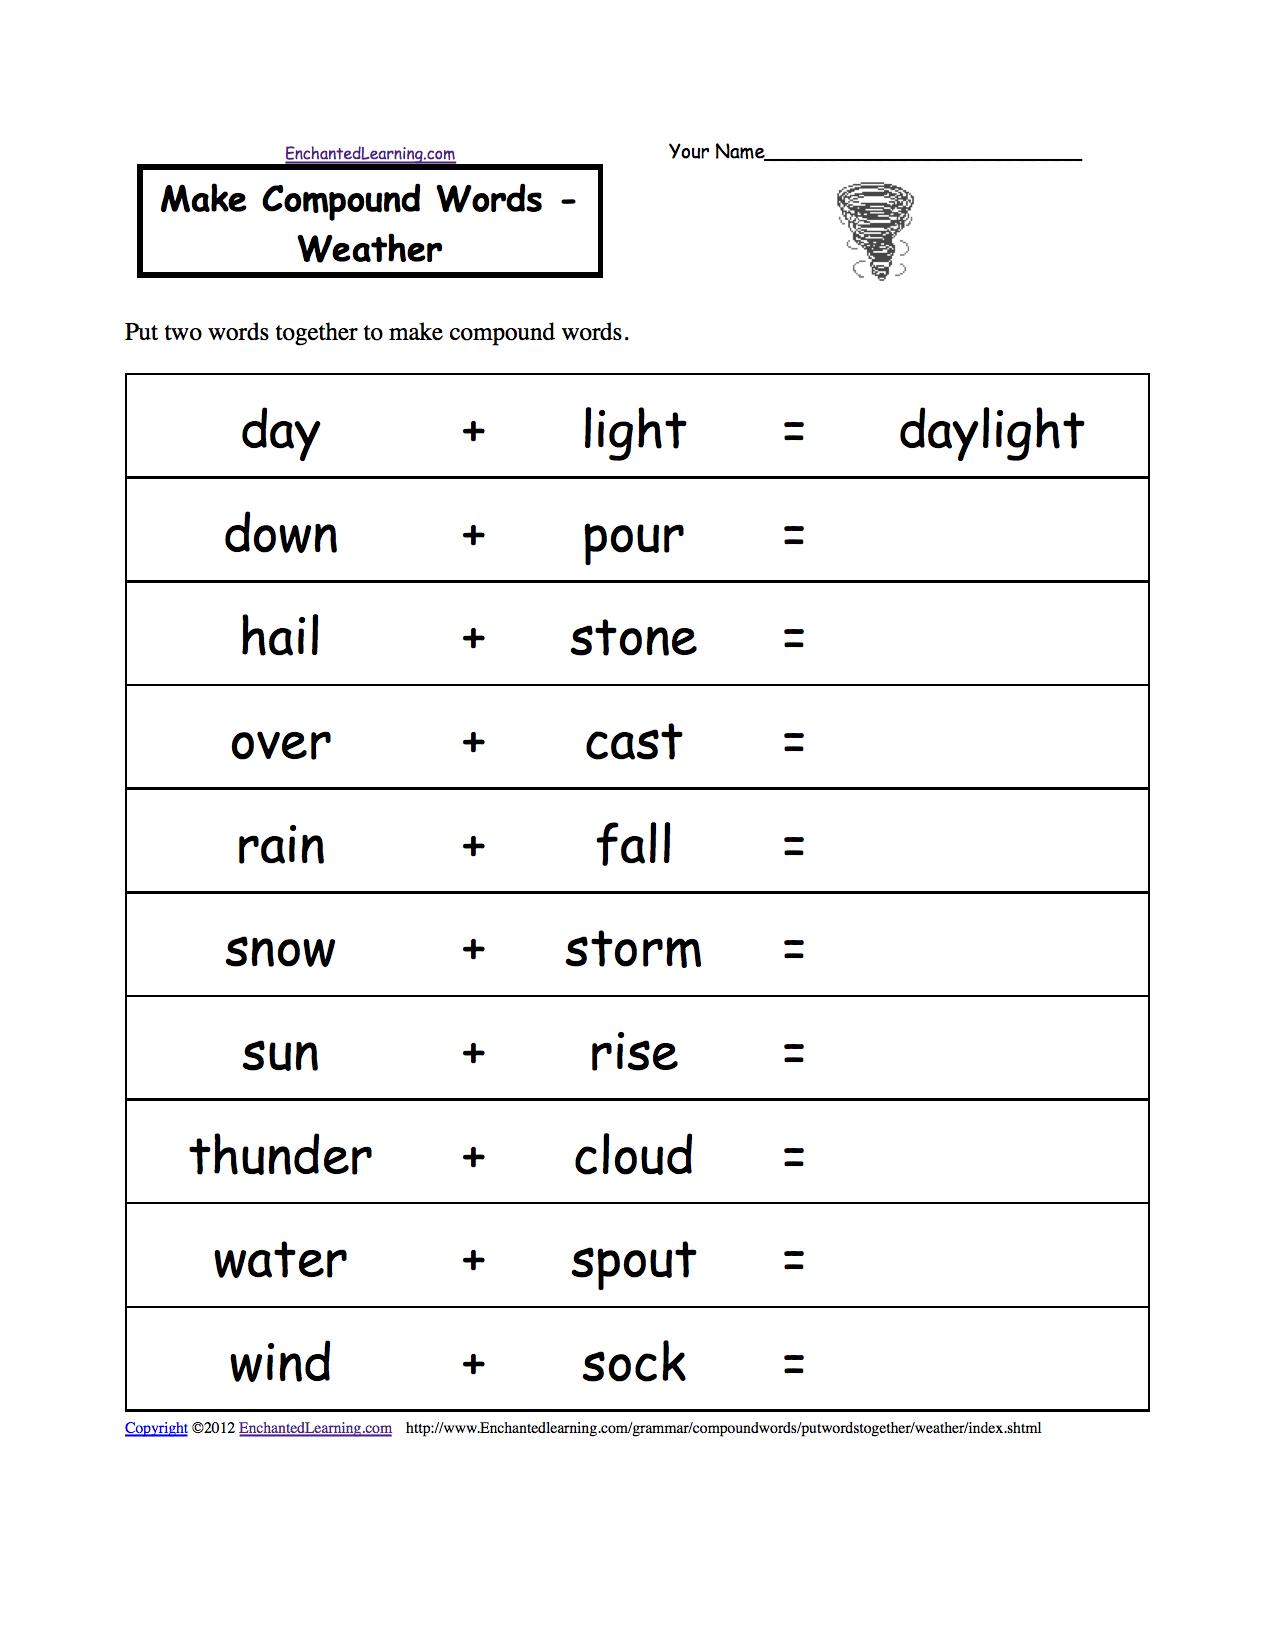 Make Compound Words, Printable Worksheets. Enchantedlearning - Free Printable Science Worksheets For Grade 2